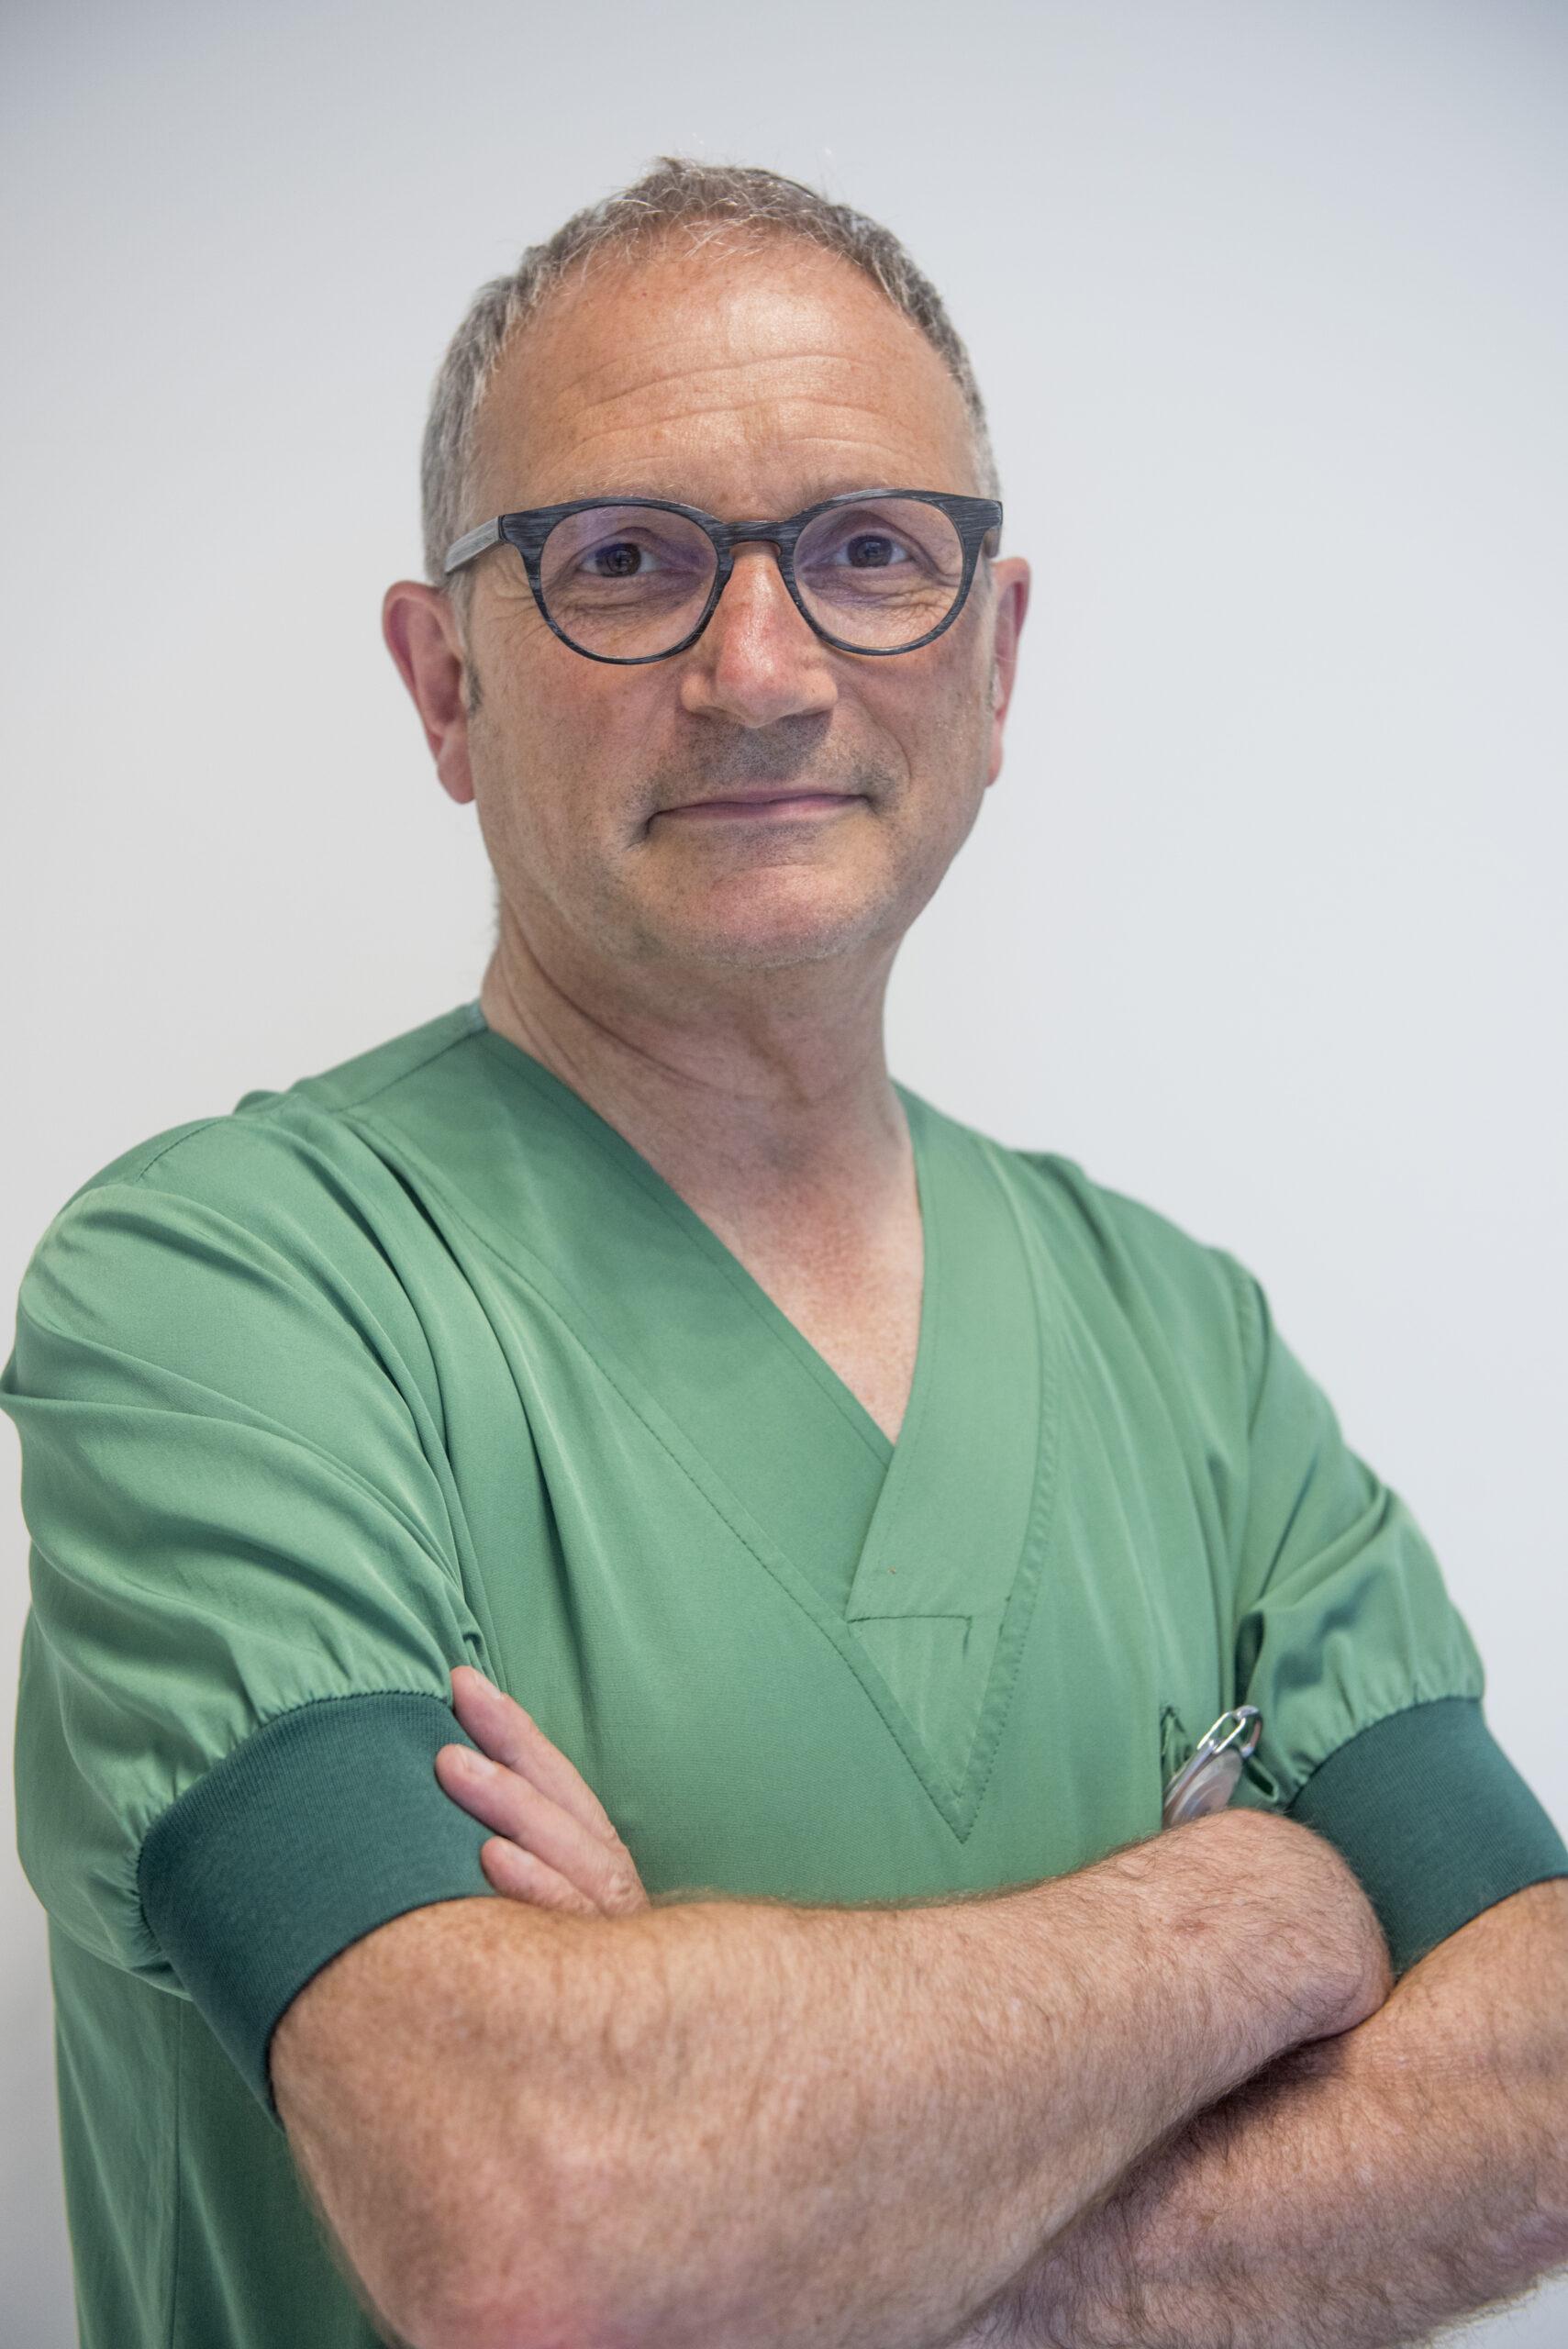 Prof. dr. Jan Deprest (© UZ Leuven)